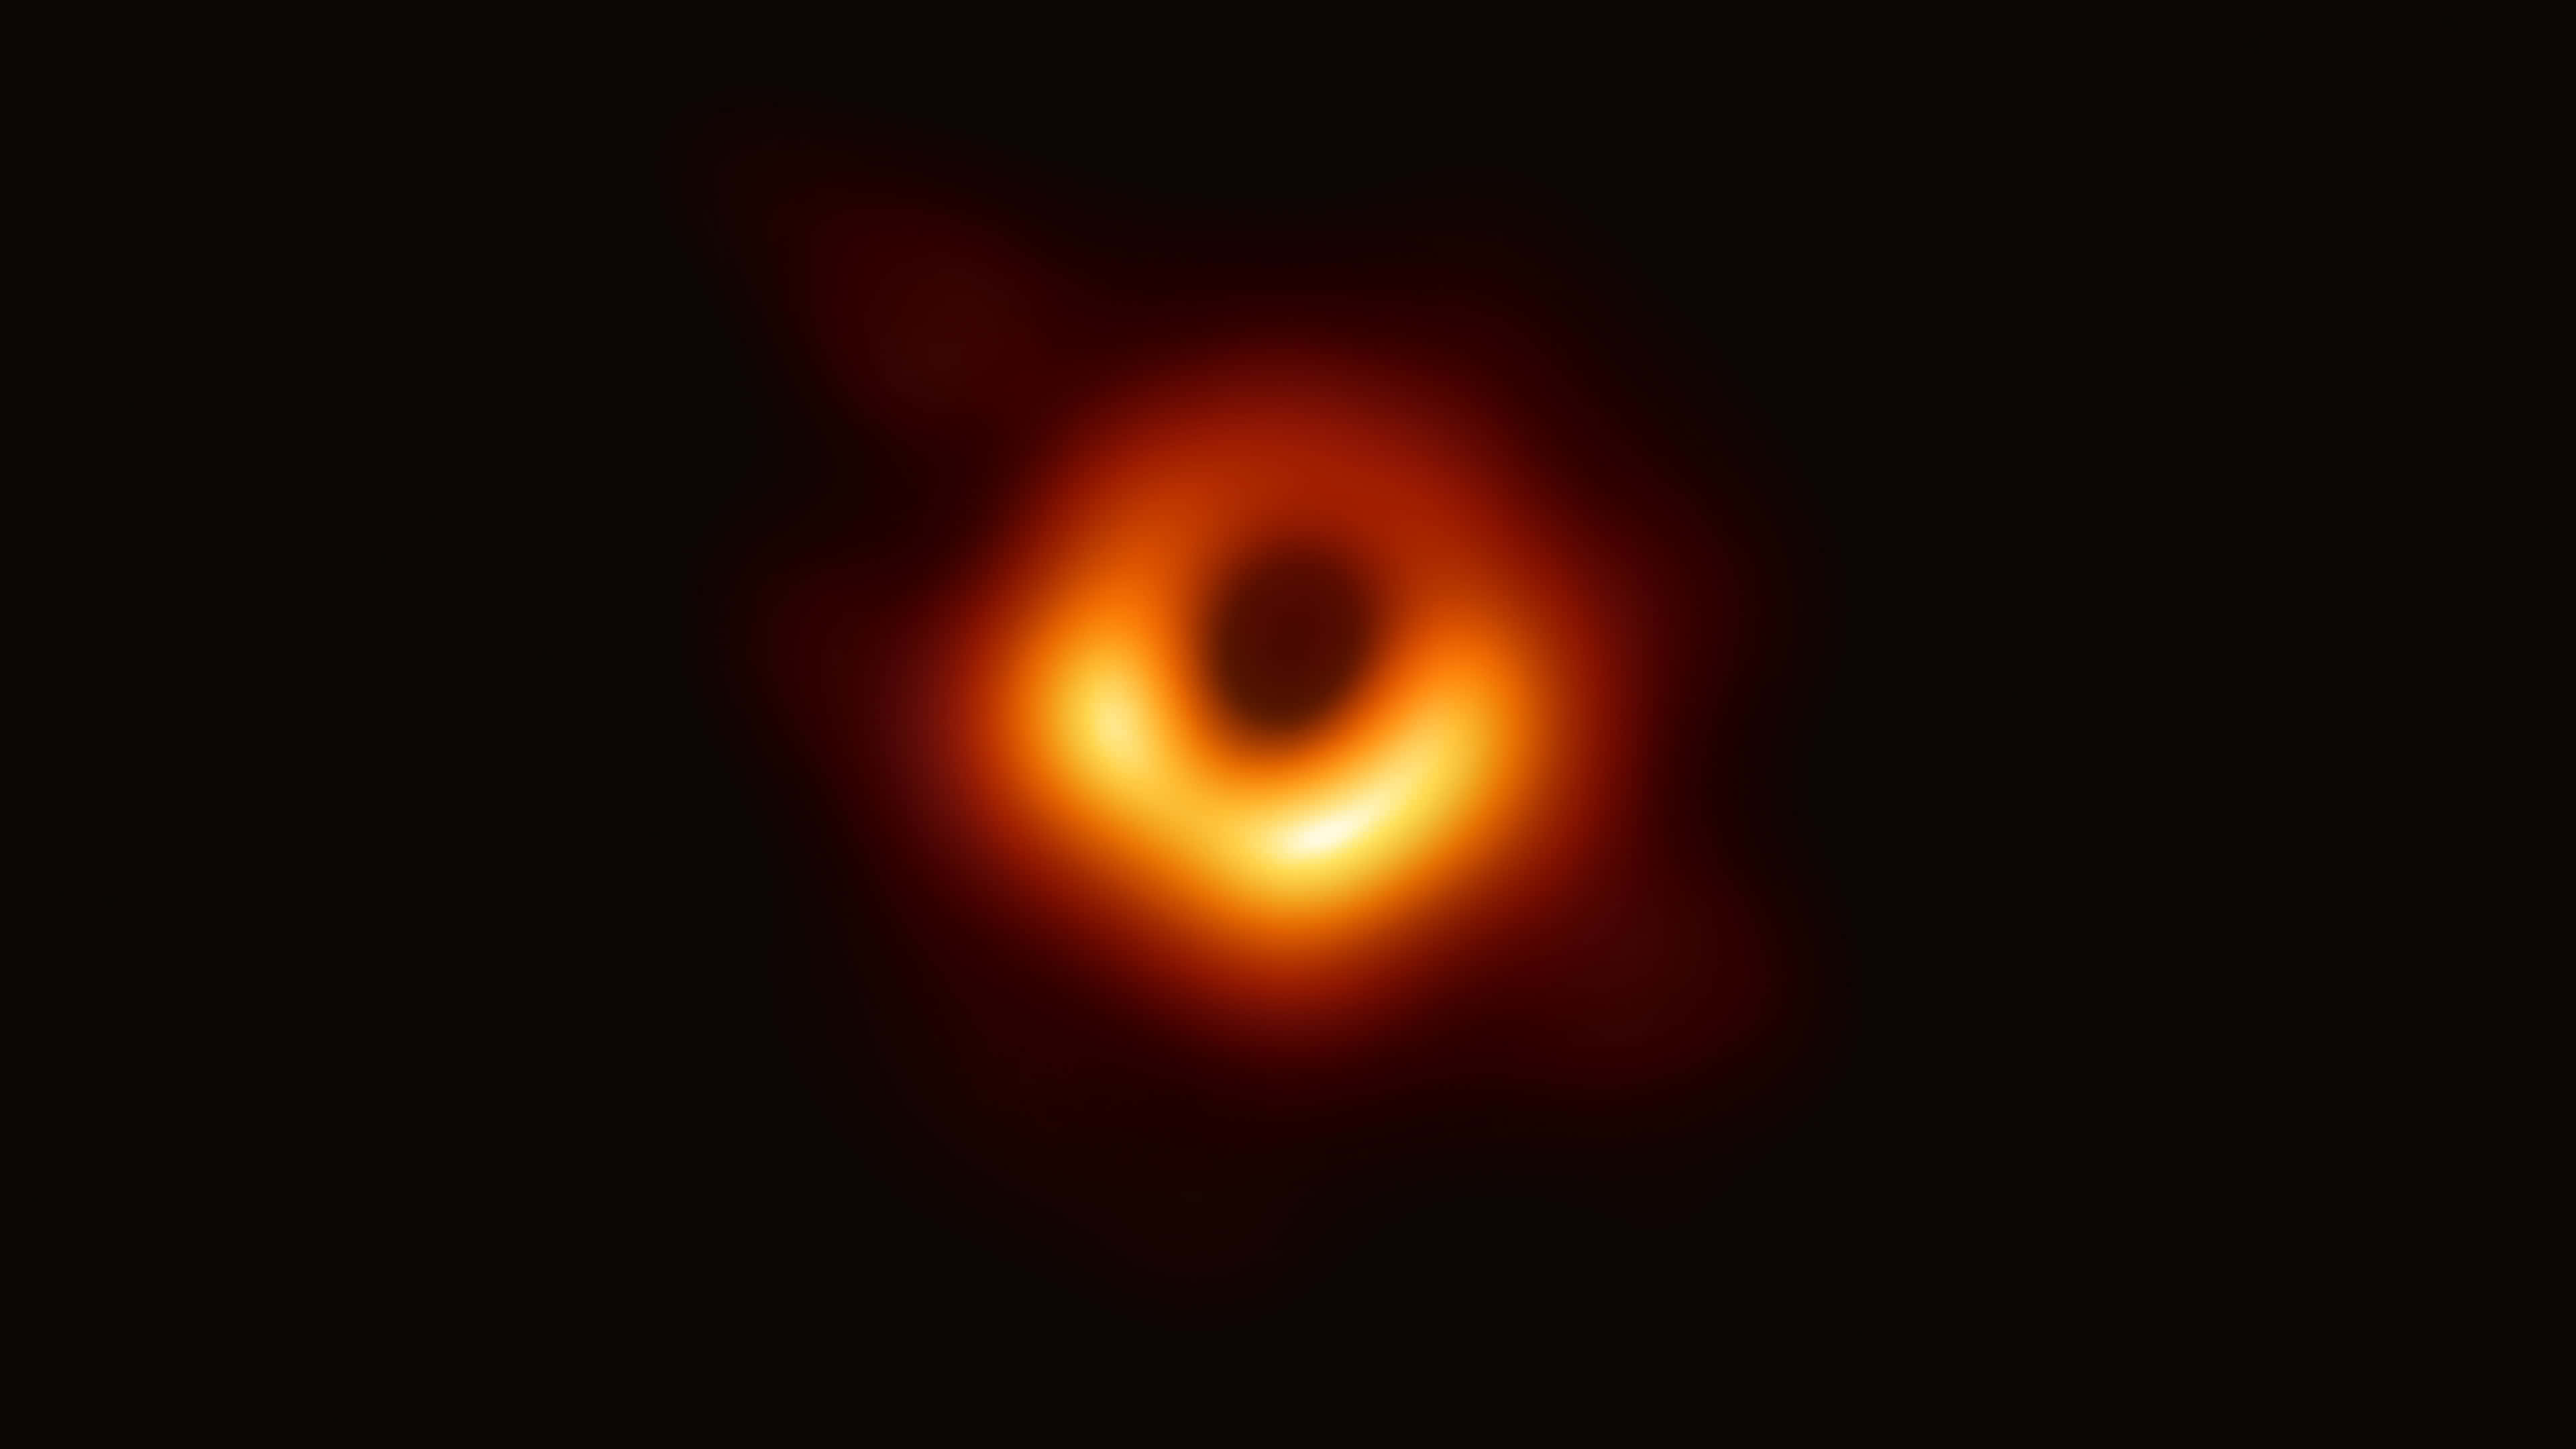 M87 Black Hole Uhd 4k Wallpaper Pixelz